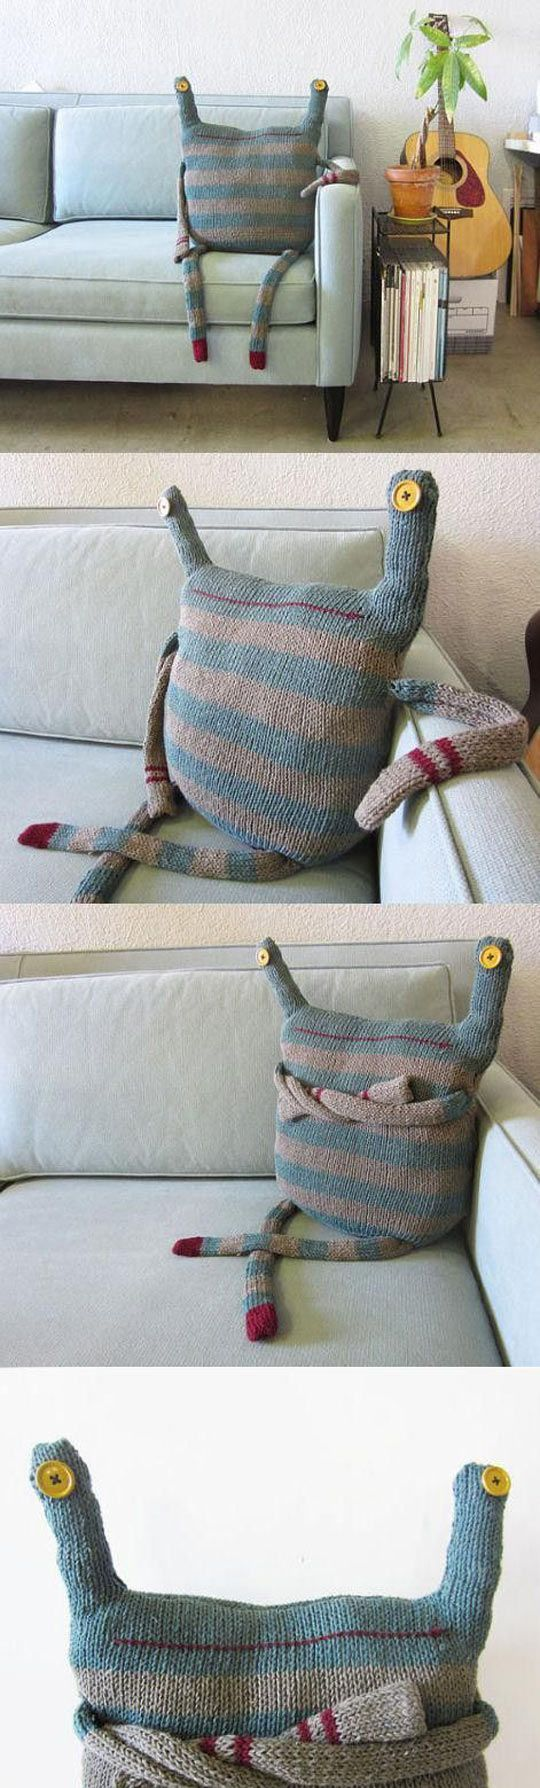 beast pillow - no.164, rolf; debi van zylHA! Love it. This simply makes me smile :-))